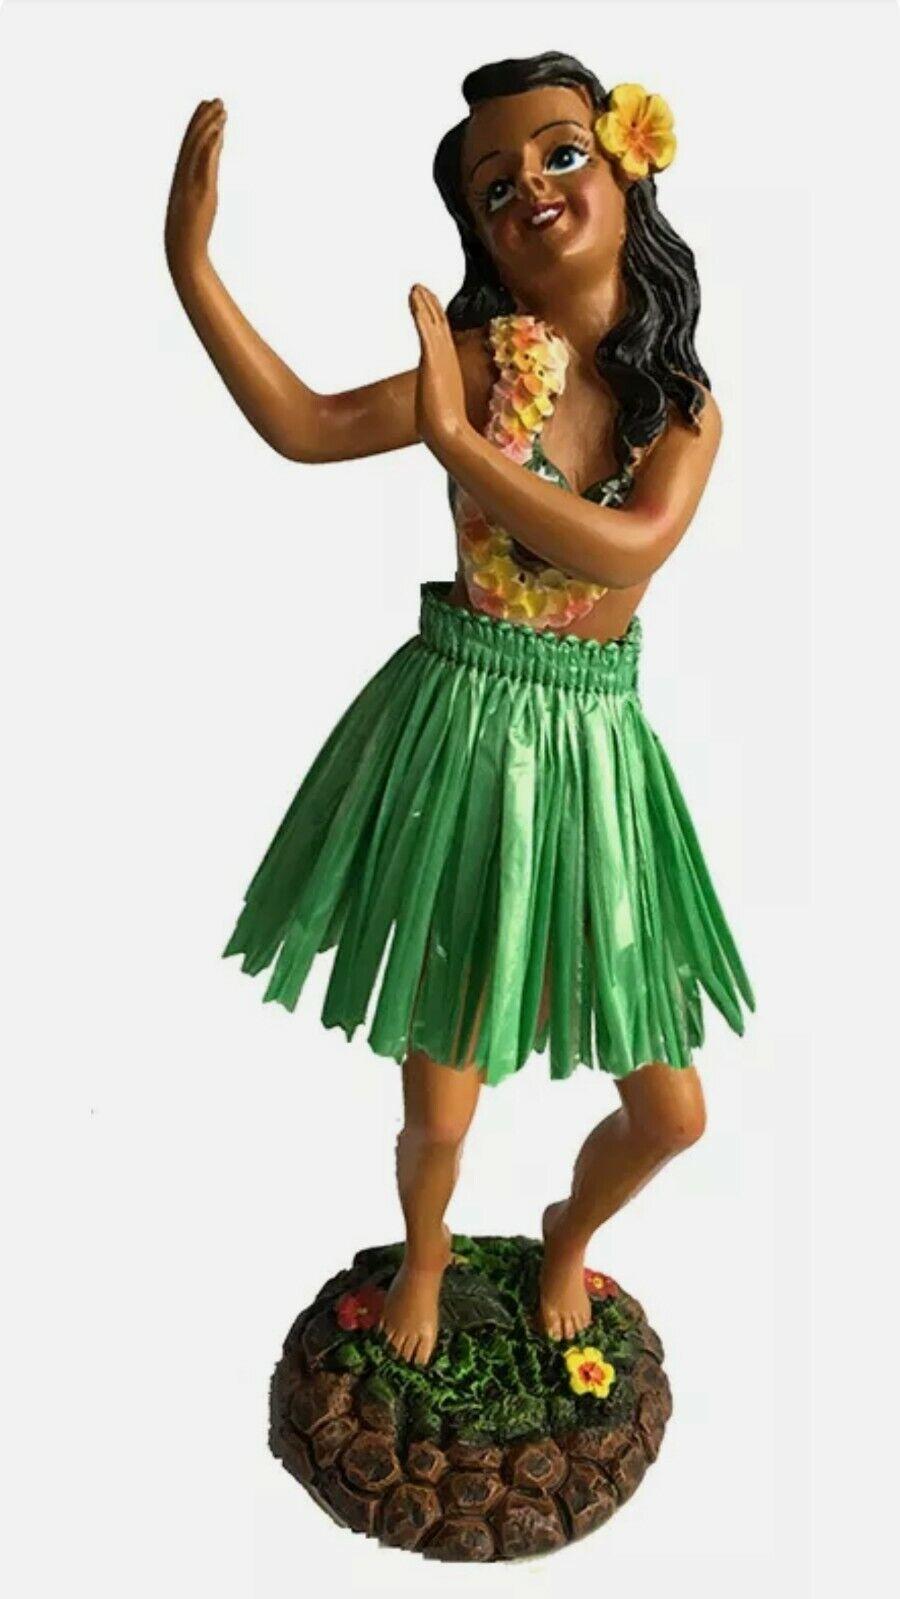 "Image 1 - Hawaiian Dashboard Hula Girl Doll Dancing Pose Green Skirt 7"" Wiggles Upper Body"